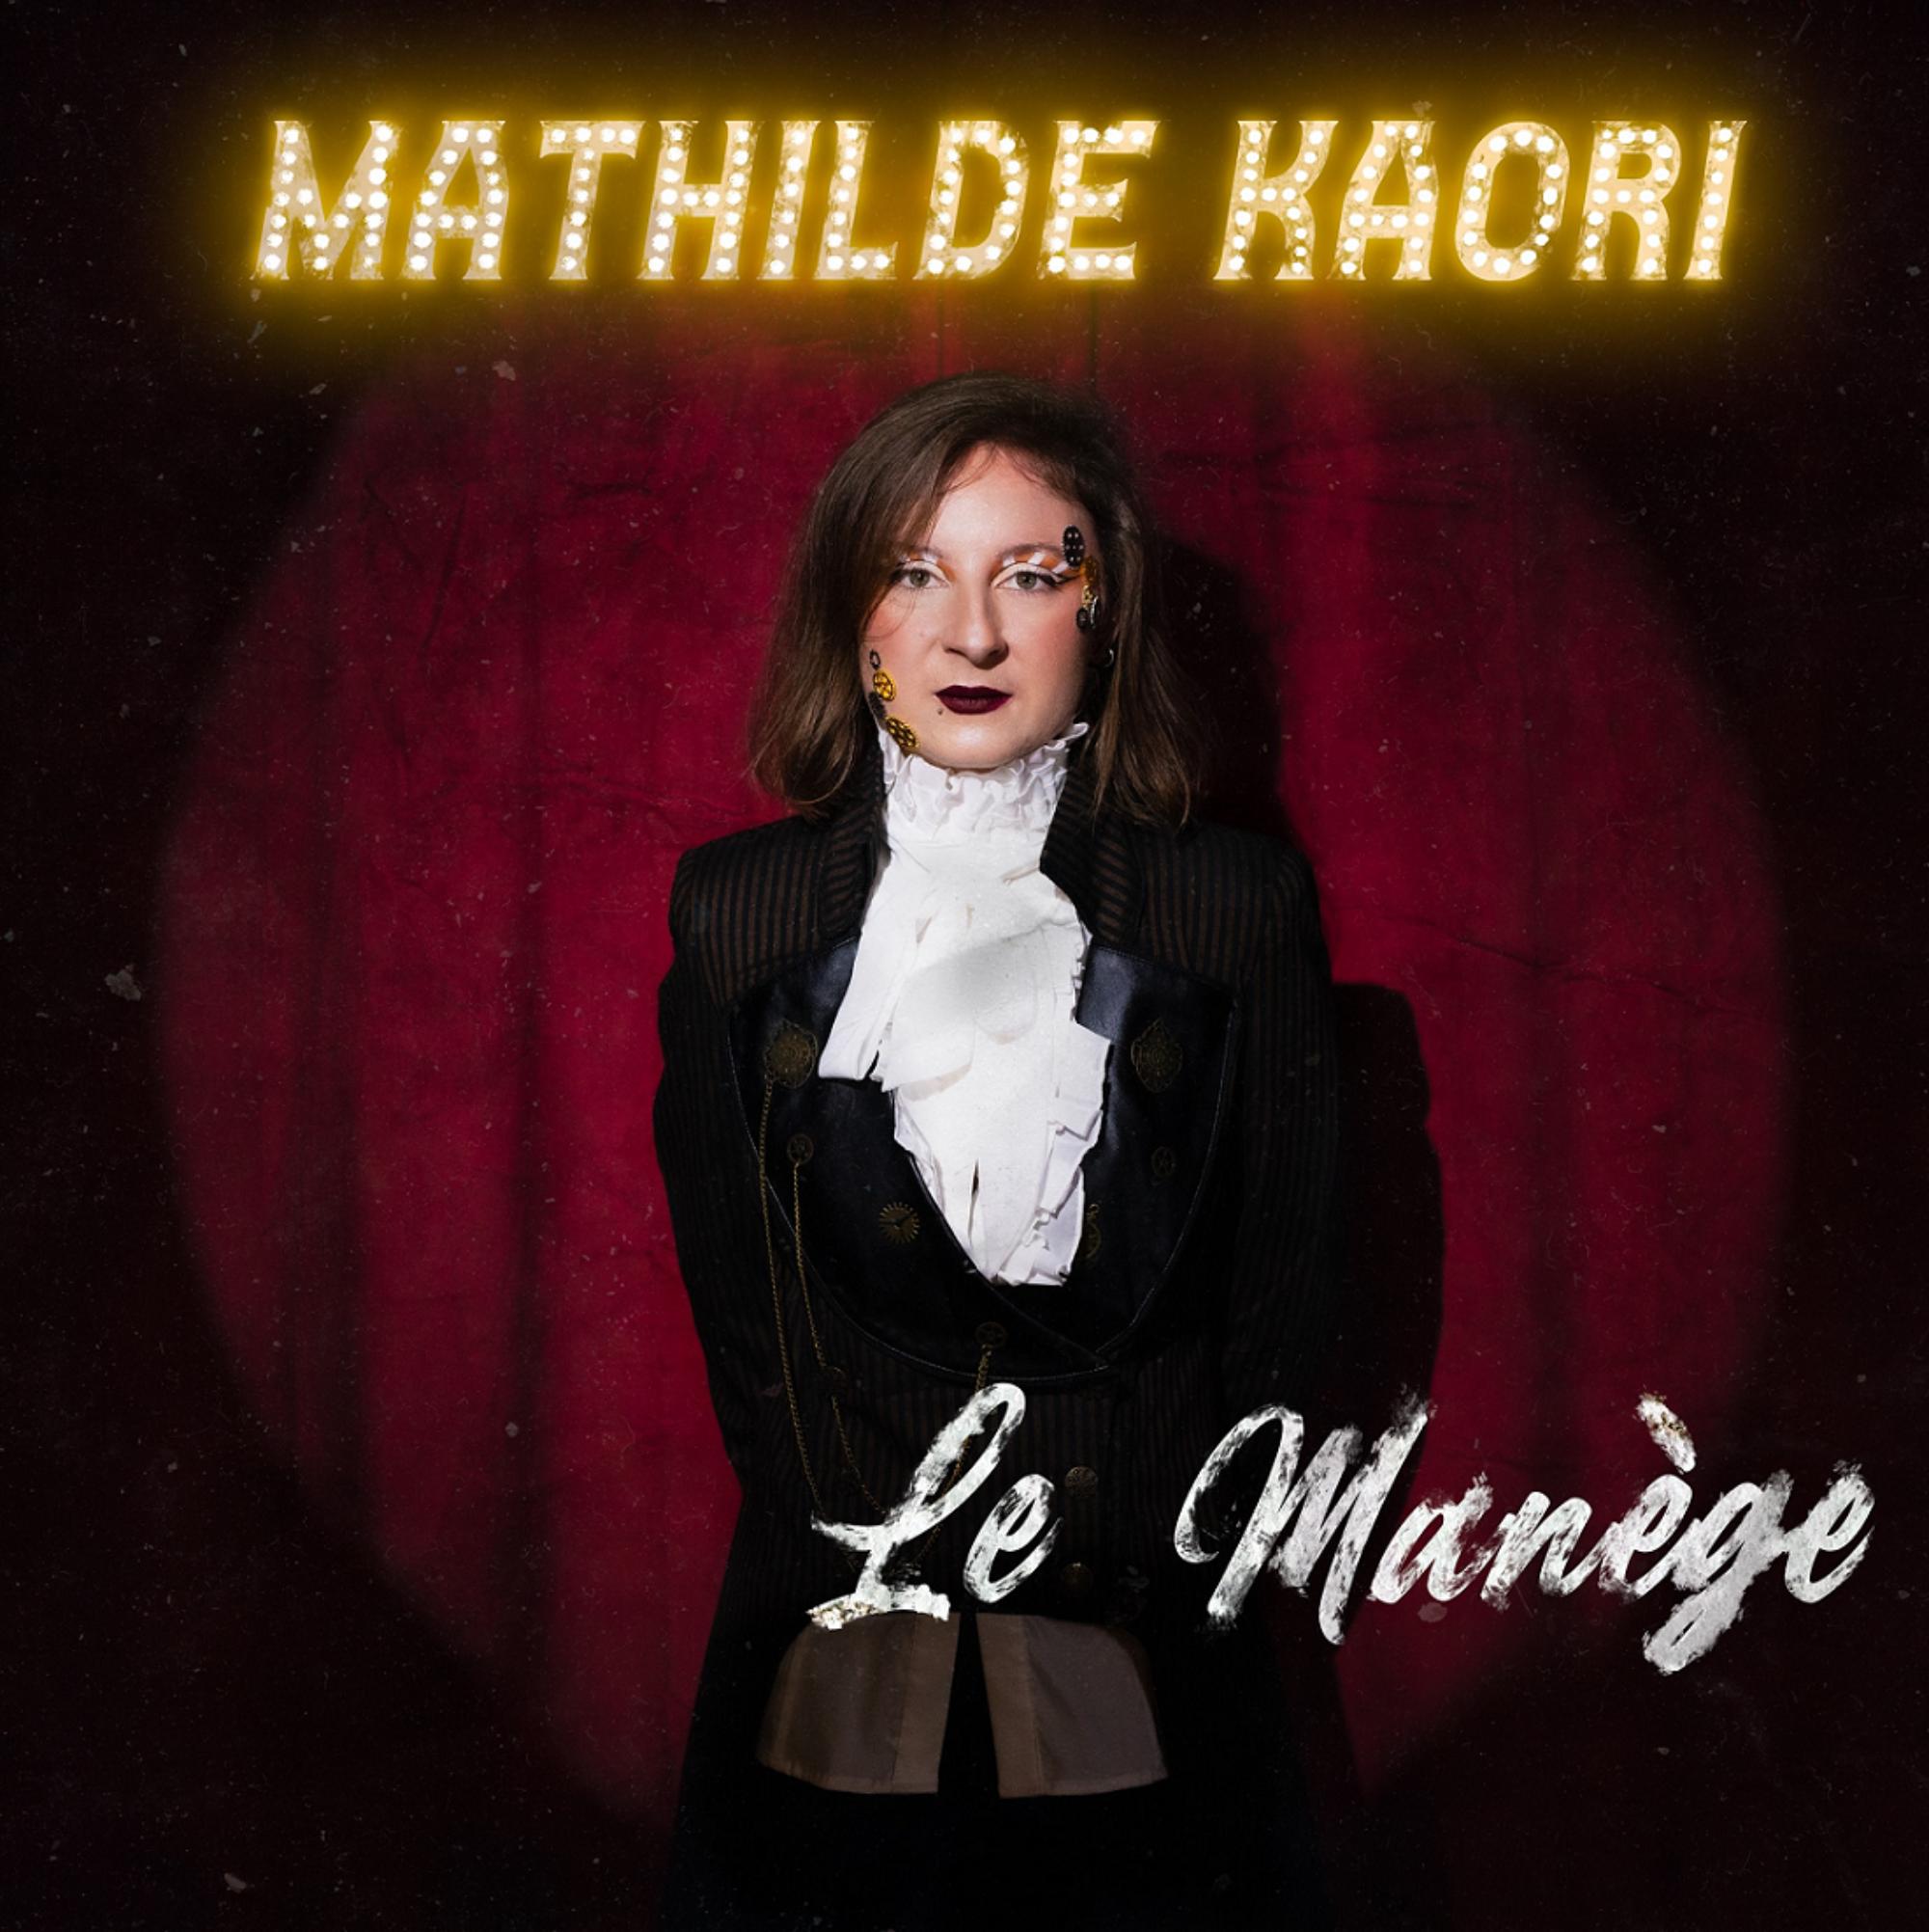 Mathilde Kaori